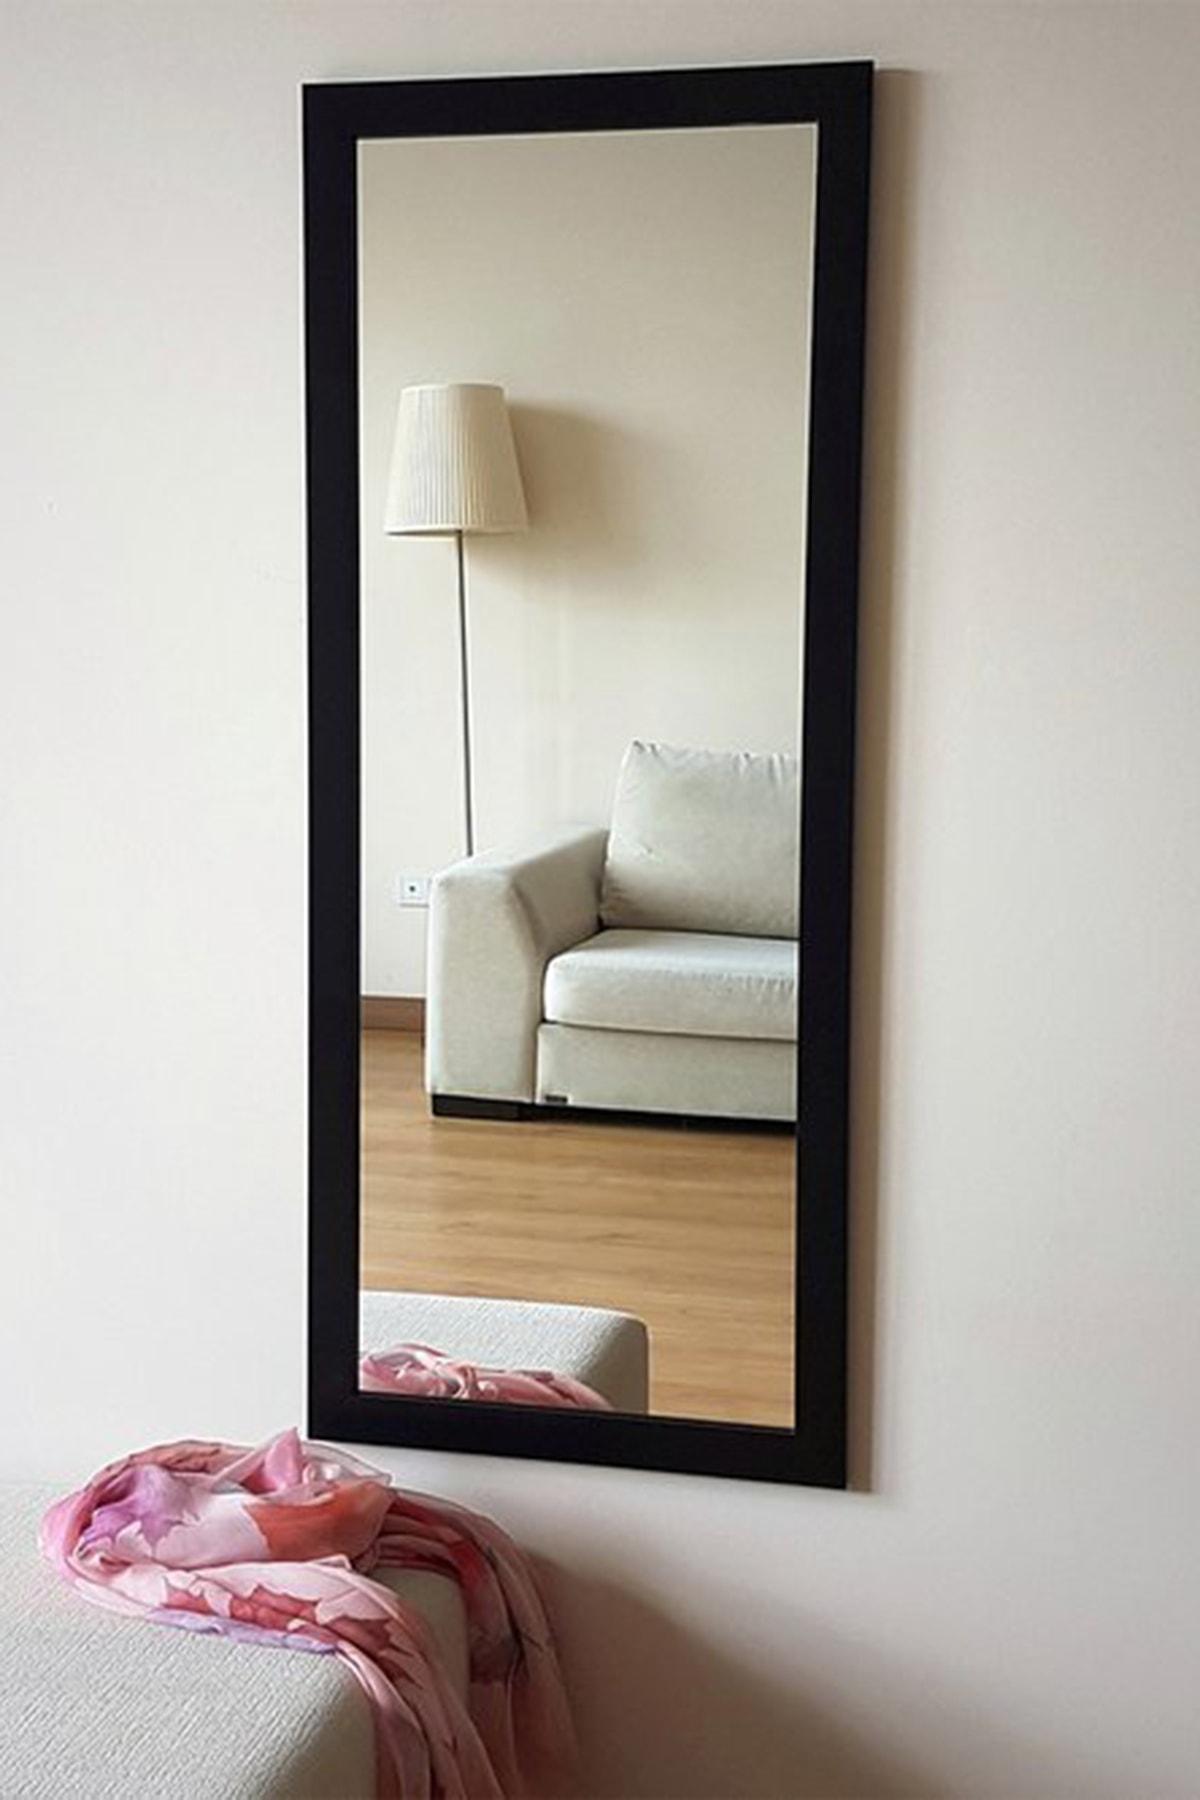 Vivense Neostill - 45X110 Cm Dekoratif Duvar Salon Ofis Boy Ayna A205 1